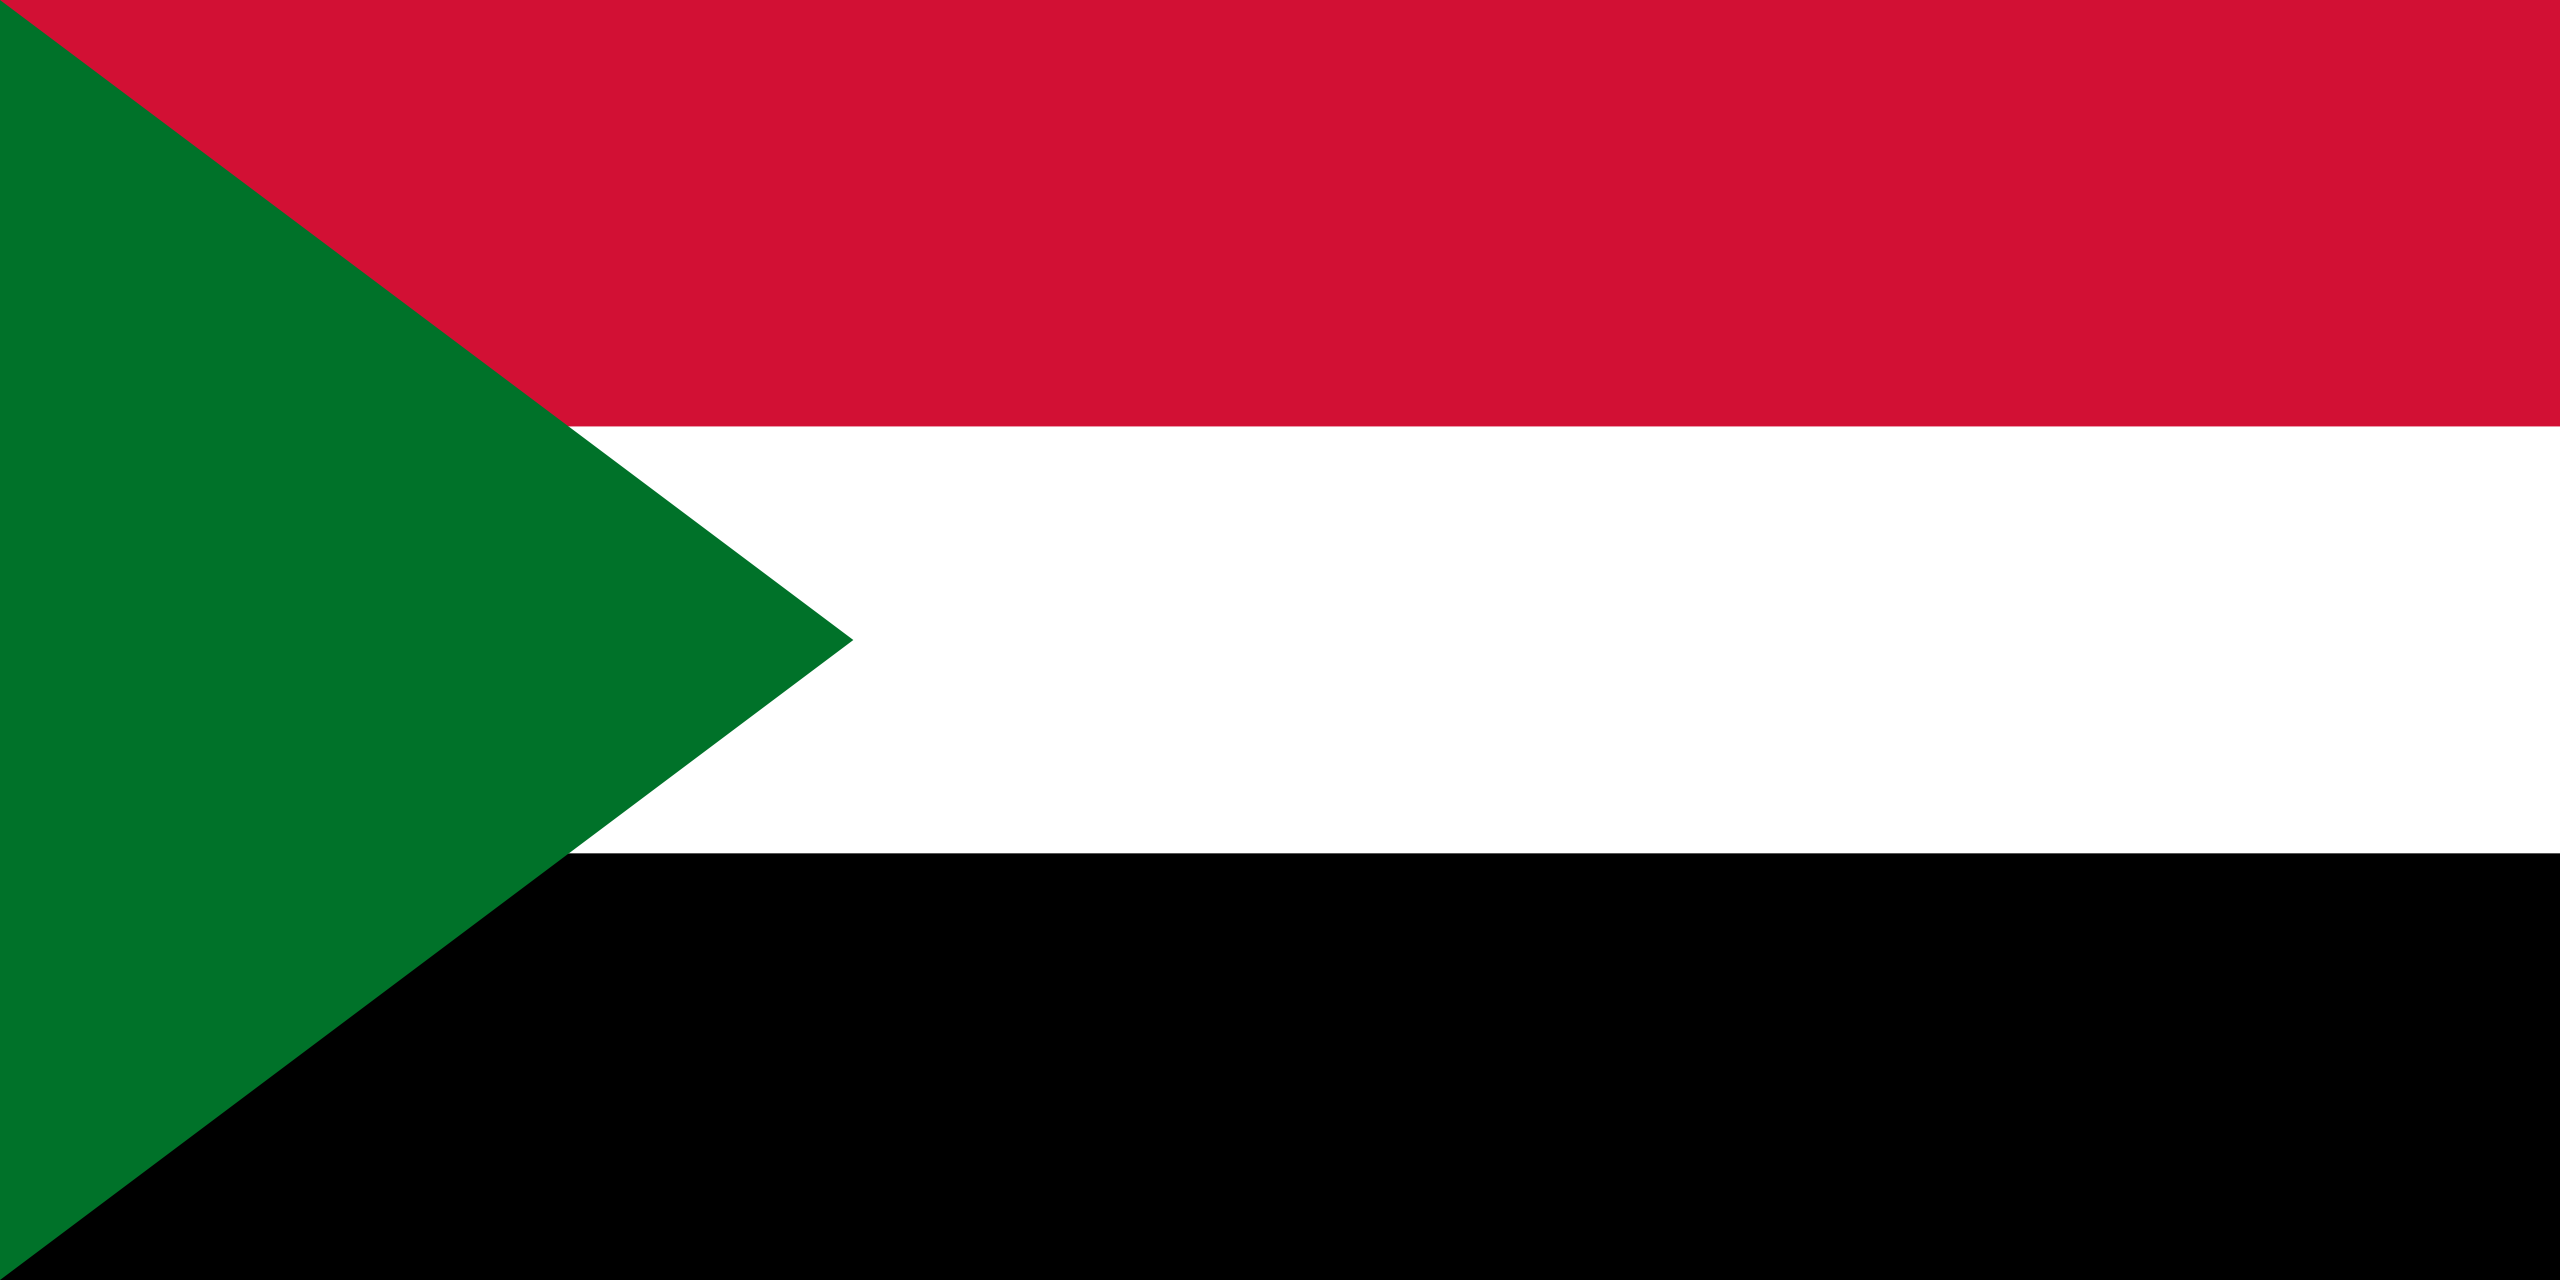 Судан, страна, Эмблема, логотип, символ - Обои HD - Профессор falken.com